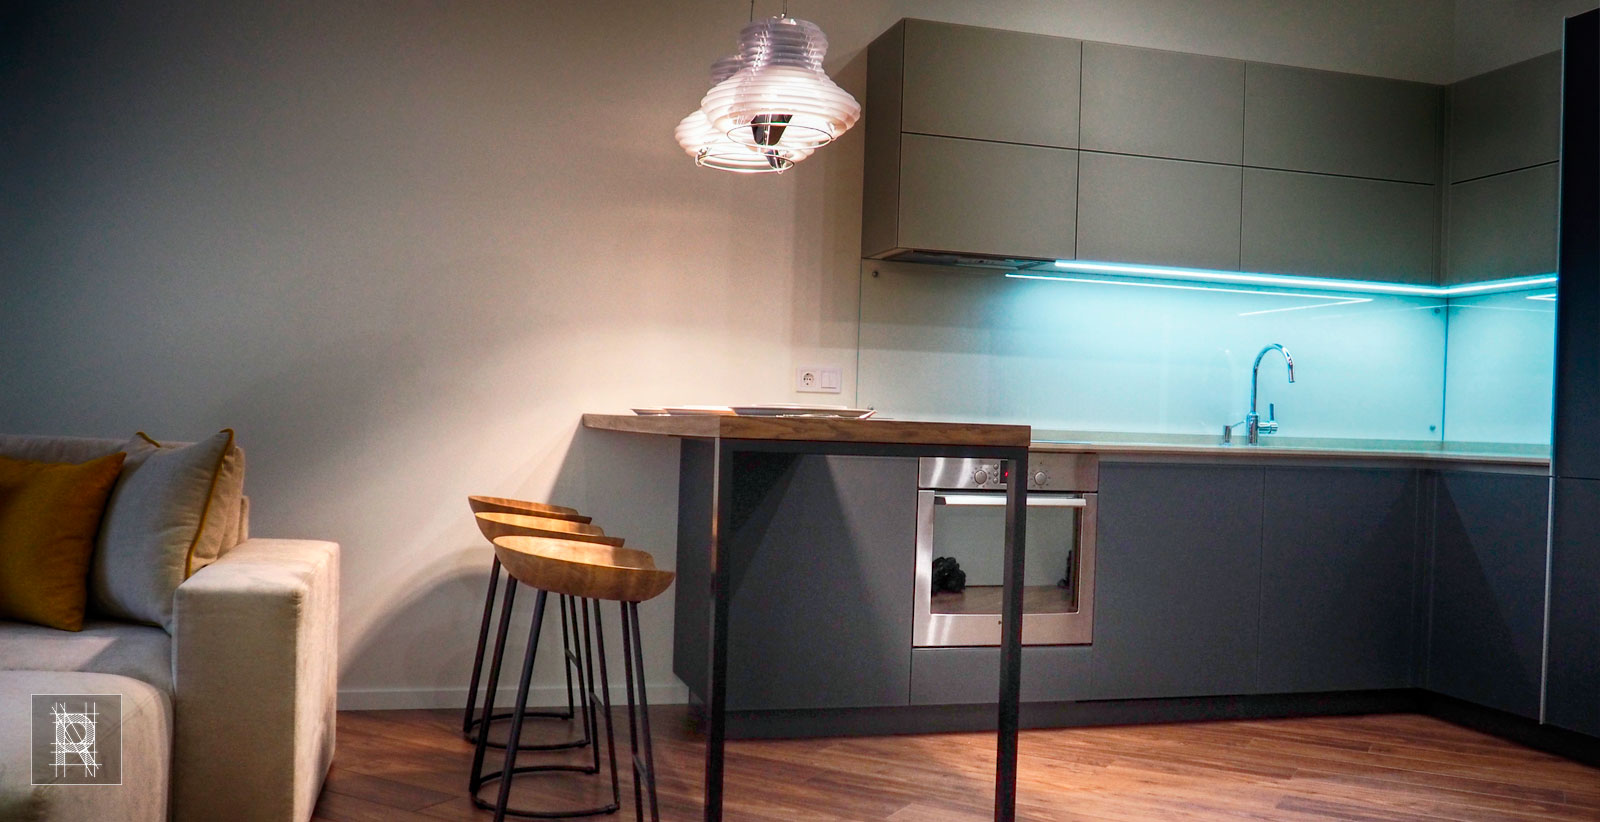 Фото обеденного стола на кухне